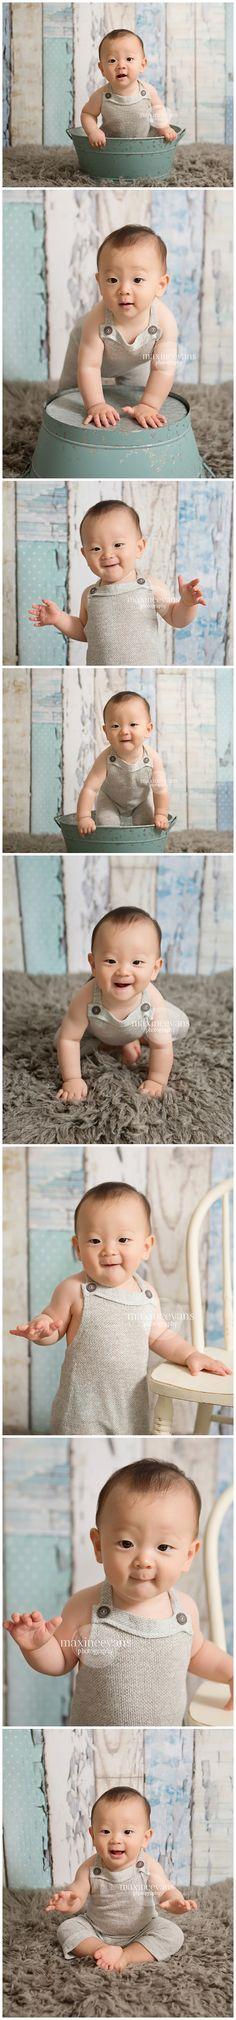 Los Angeles Baby Photographer - Maxine Evans Photography   www.maxineevansphotography.com  Los Angeles | Thousand Oaks | Woodland Hills | West LA | Agoura Hills | Studio City #losangelesnewbornbaby #losangelesnewborn #losangelesnewbornphotographer